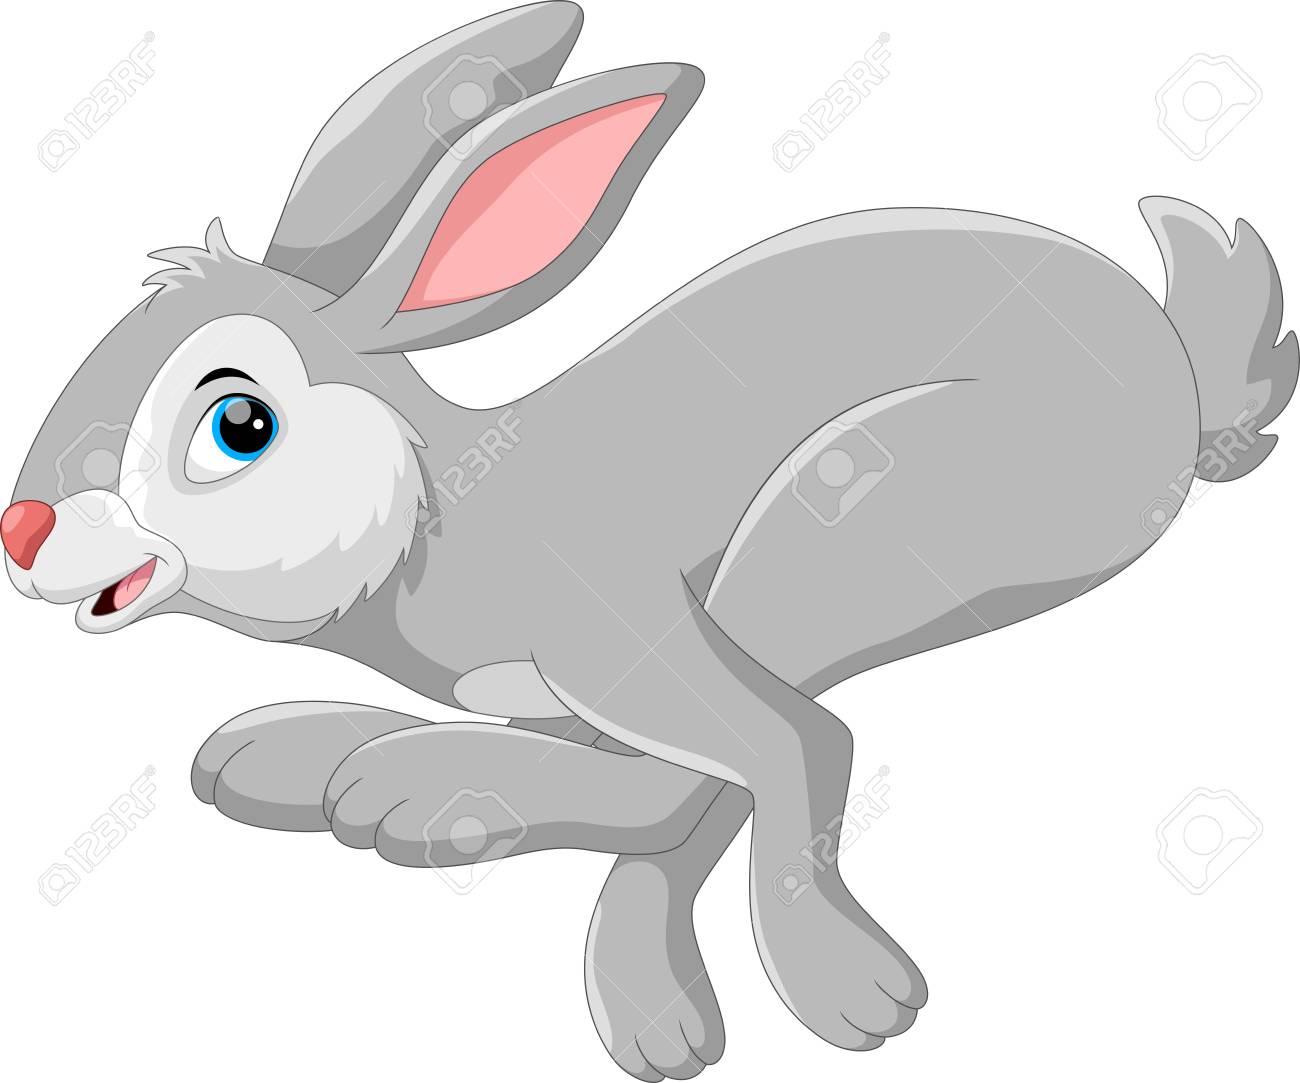 Cute cartoon rabbit running - 79937216